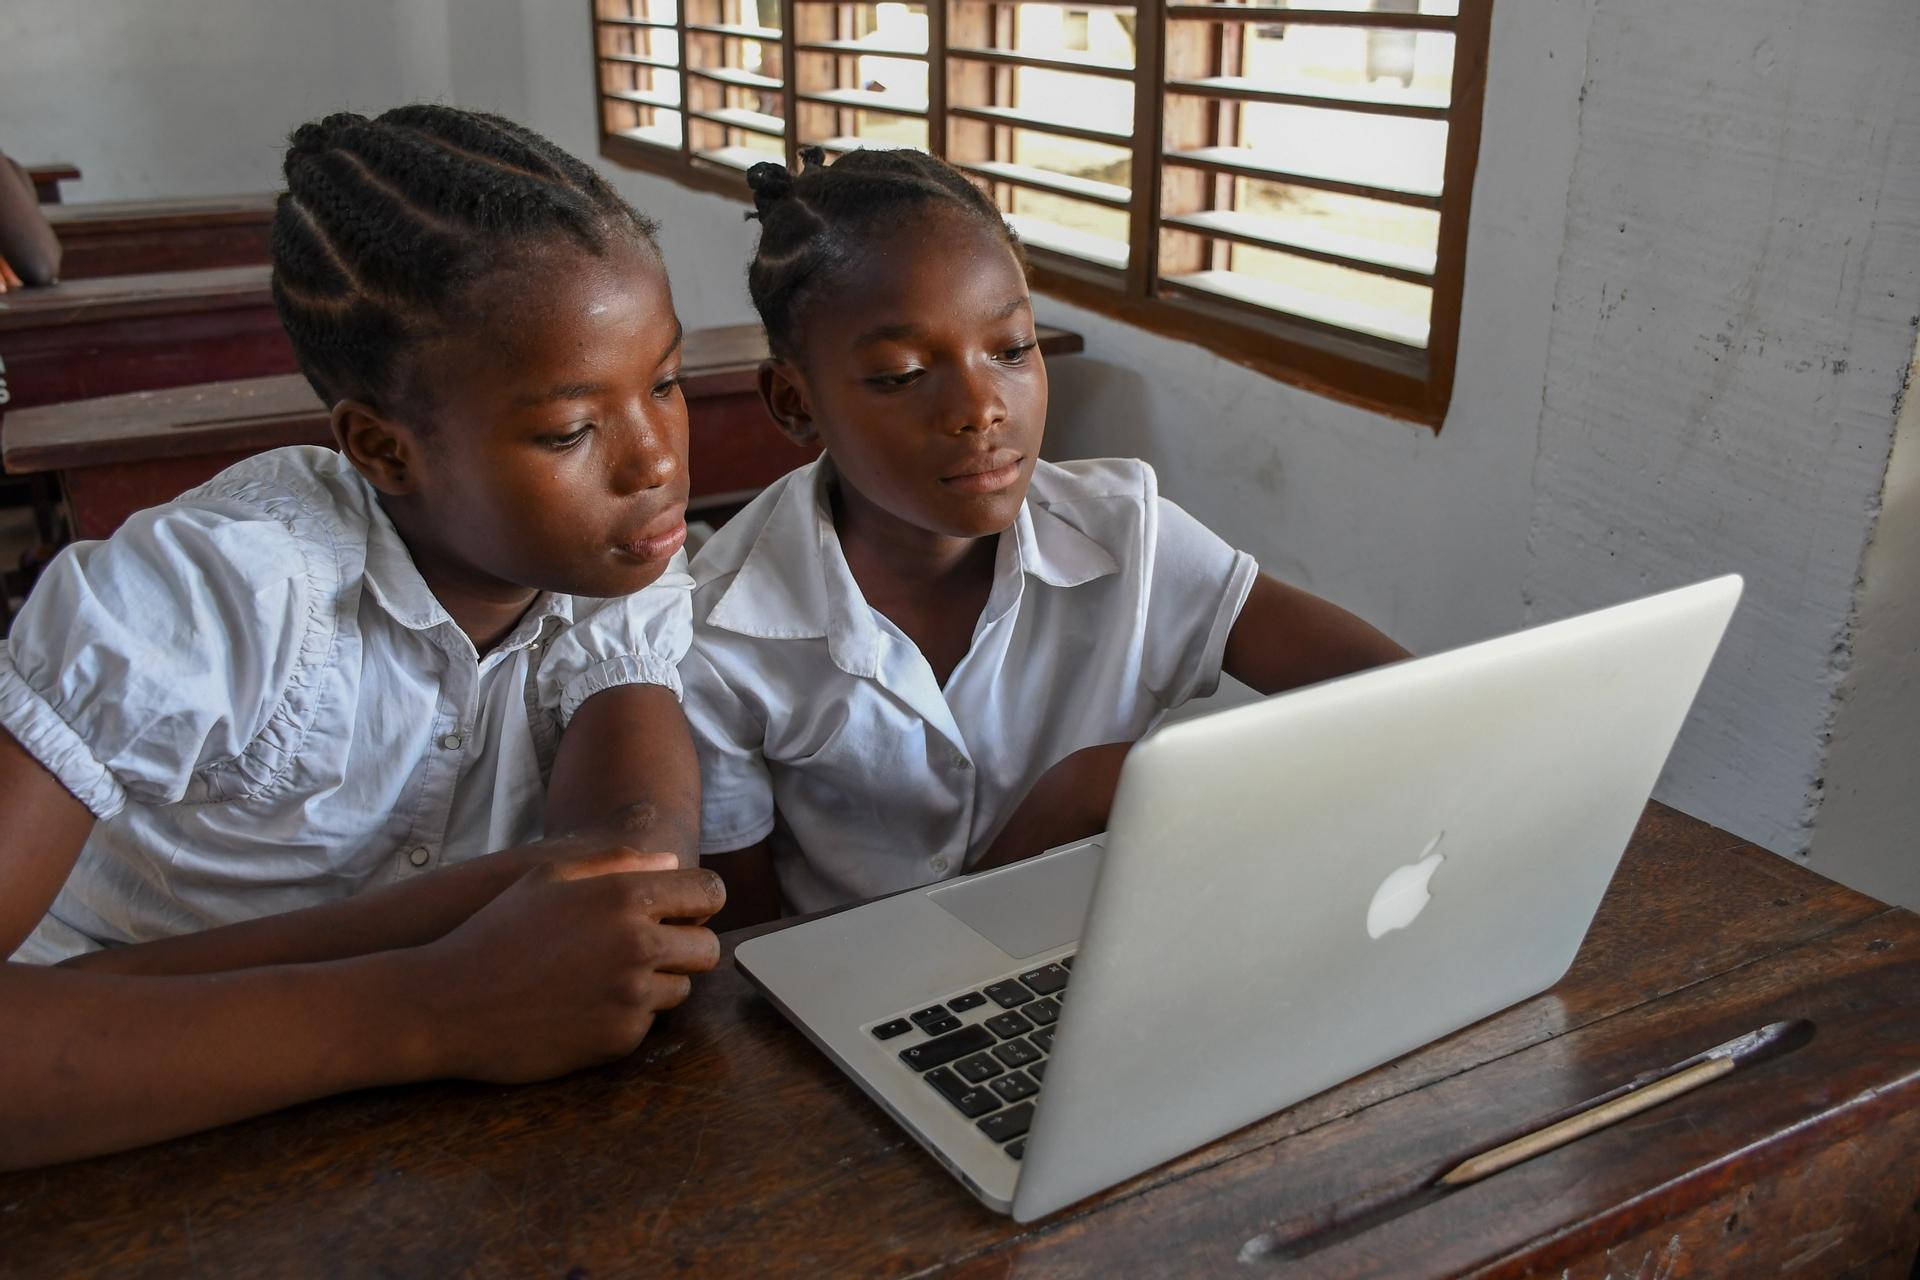 Africa, free, photo, school, classroom, classmates, student, schoolgirl, work, macbook, laptop, computer training, education, study, technology